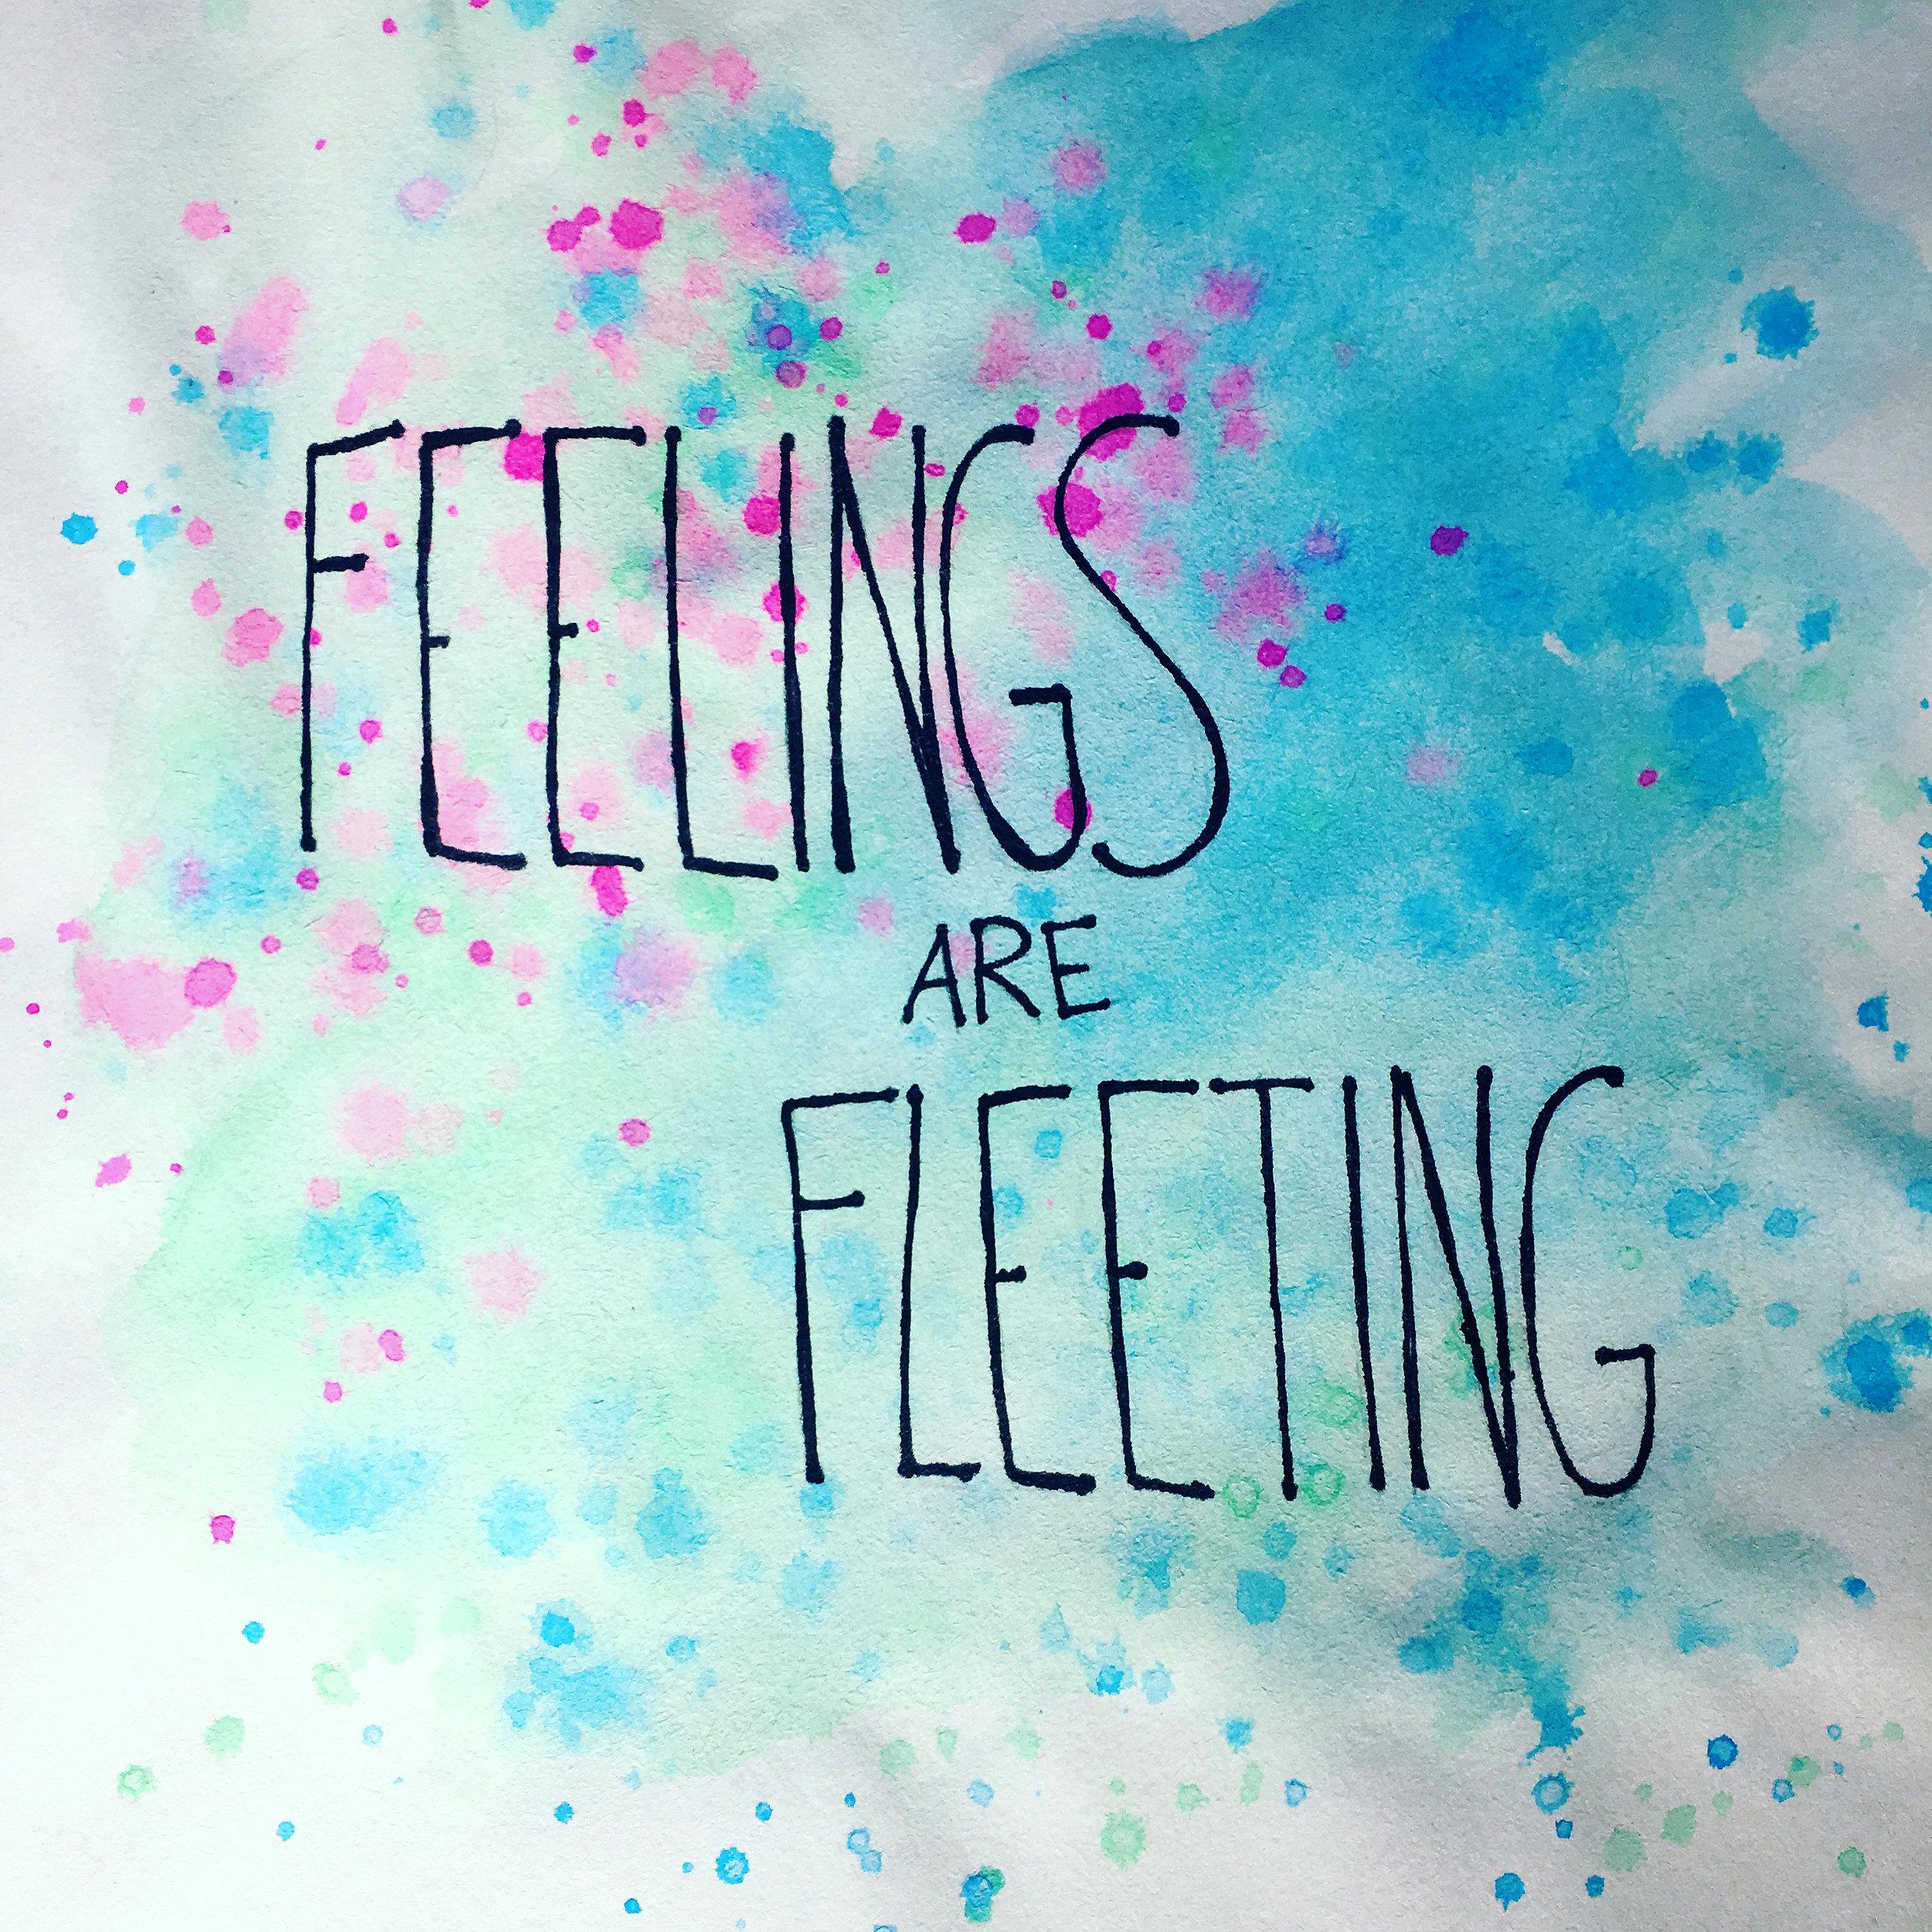 feelings-are-fleeting